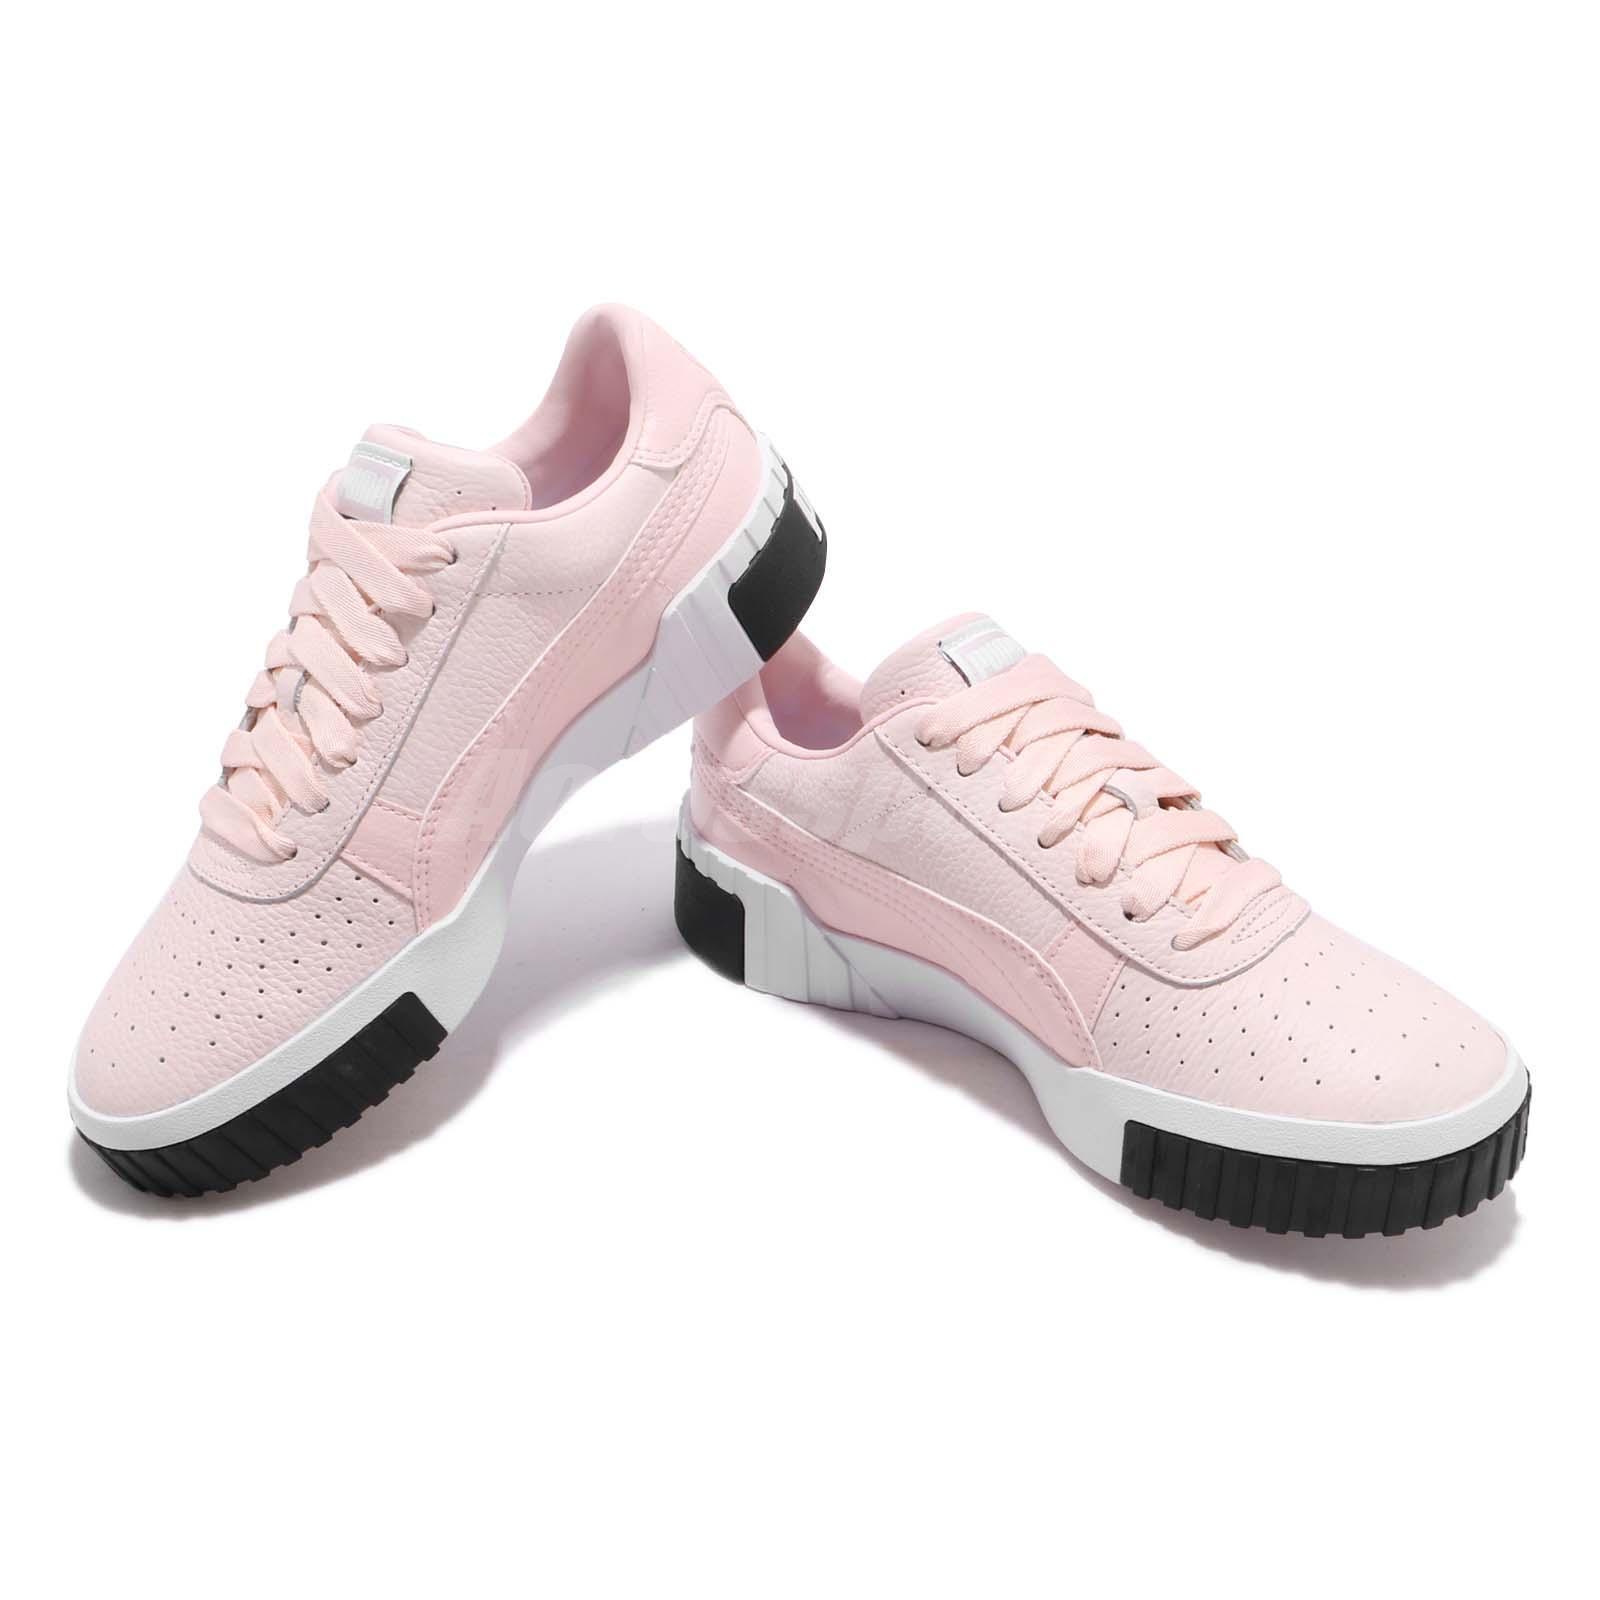 bf454b8a Puma Cali Wns Pink Dogwood White Women Fashion Shoes Sneakers 369155 ...